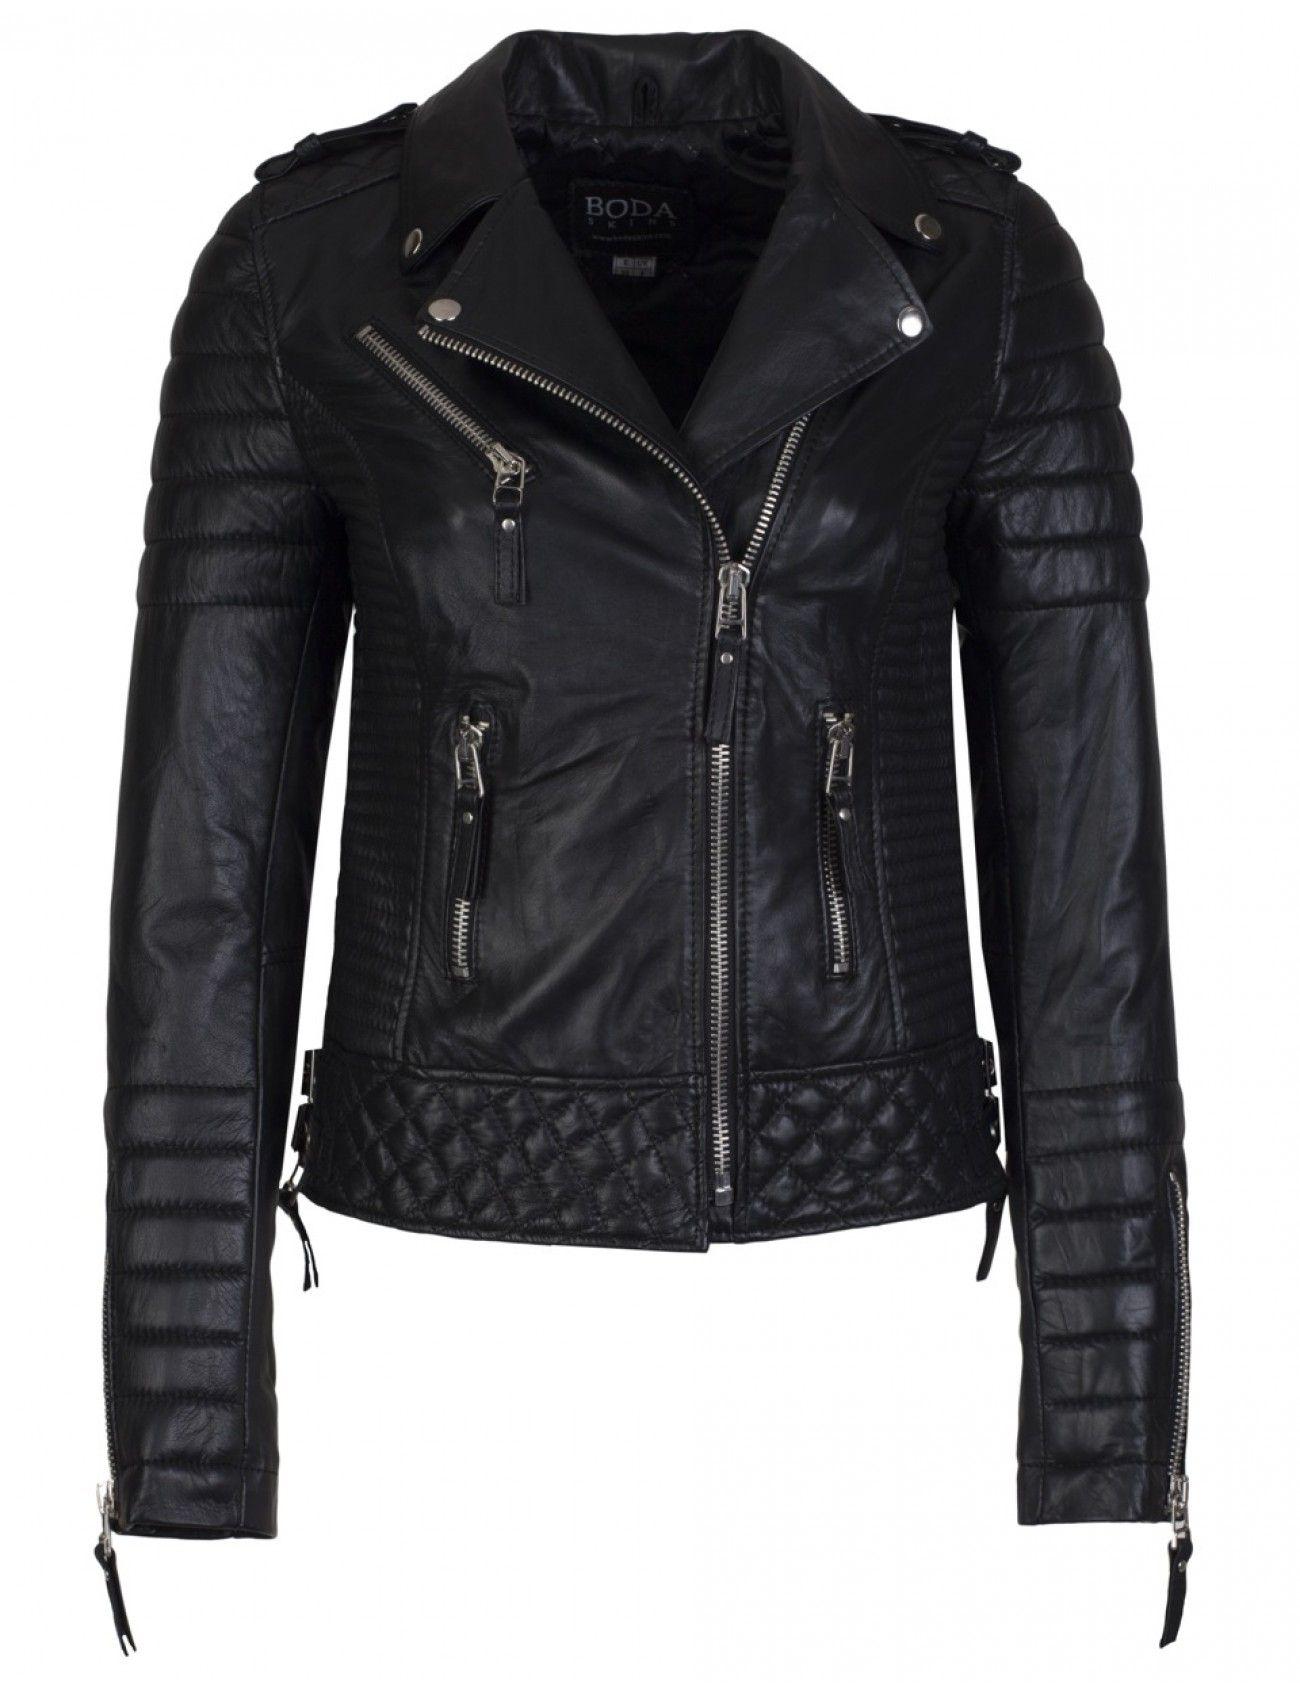 83cda54fa727 Boda Skins Kay Michaels Oil Black Quilted Biker Jacket